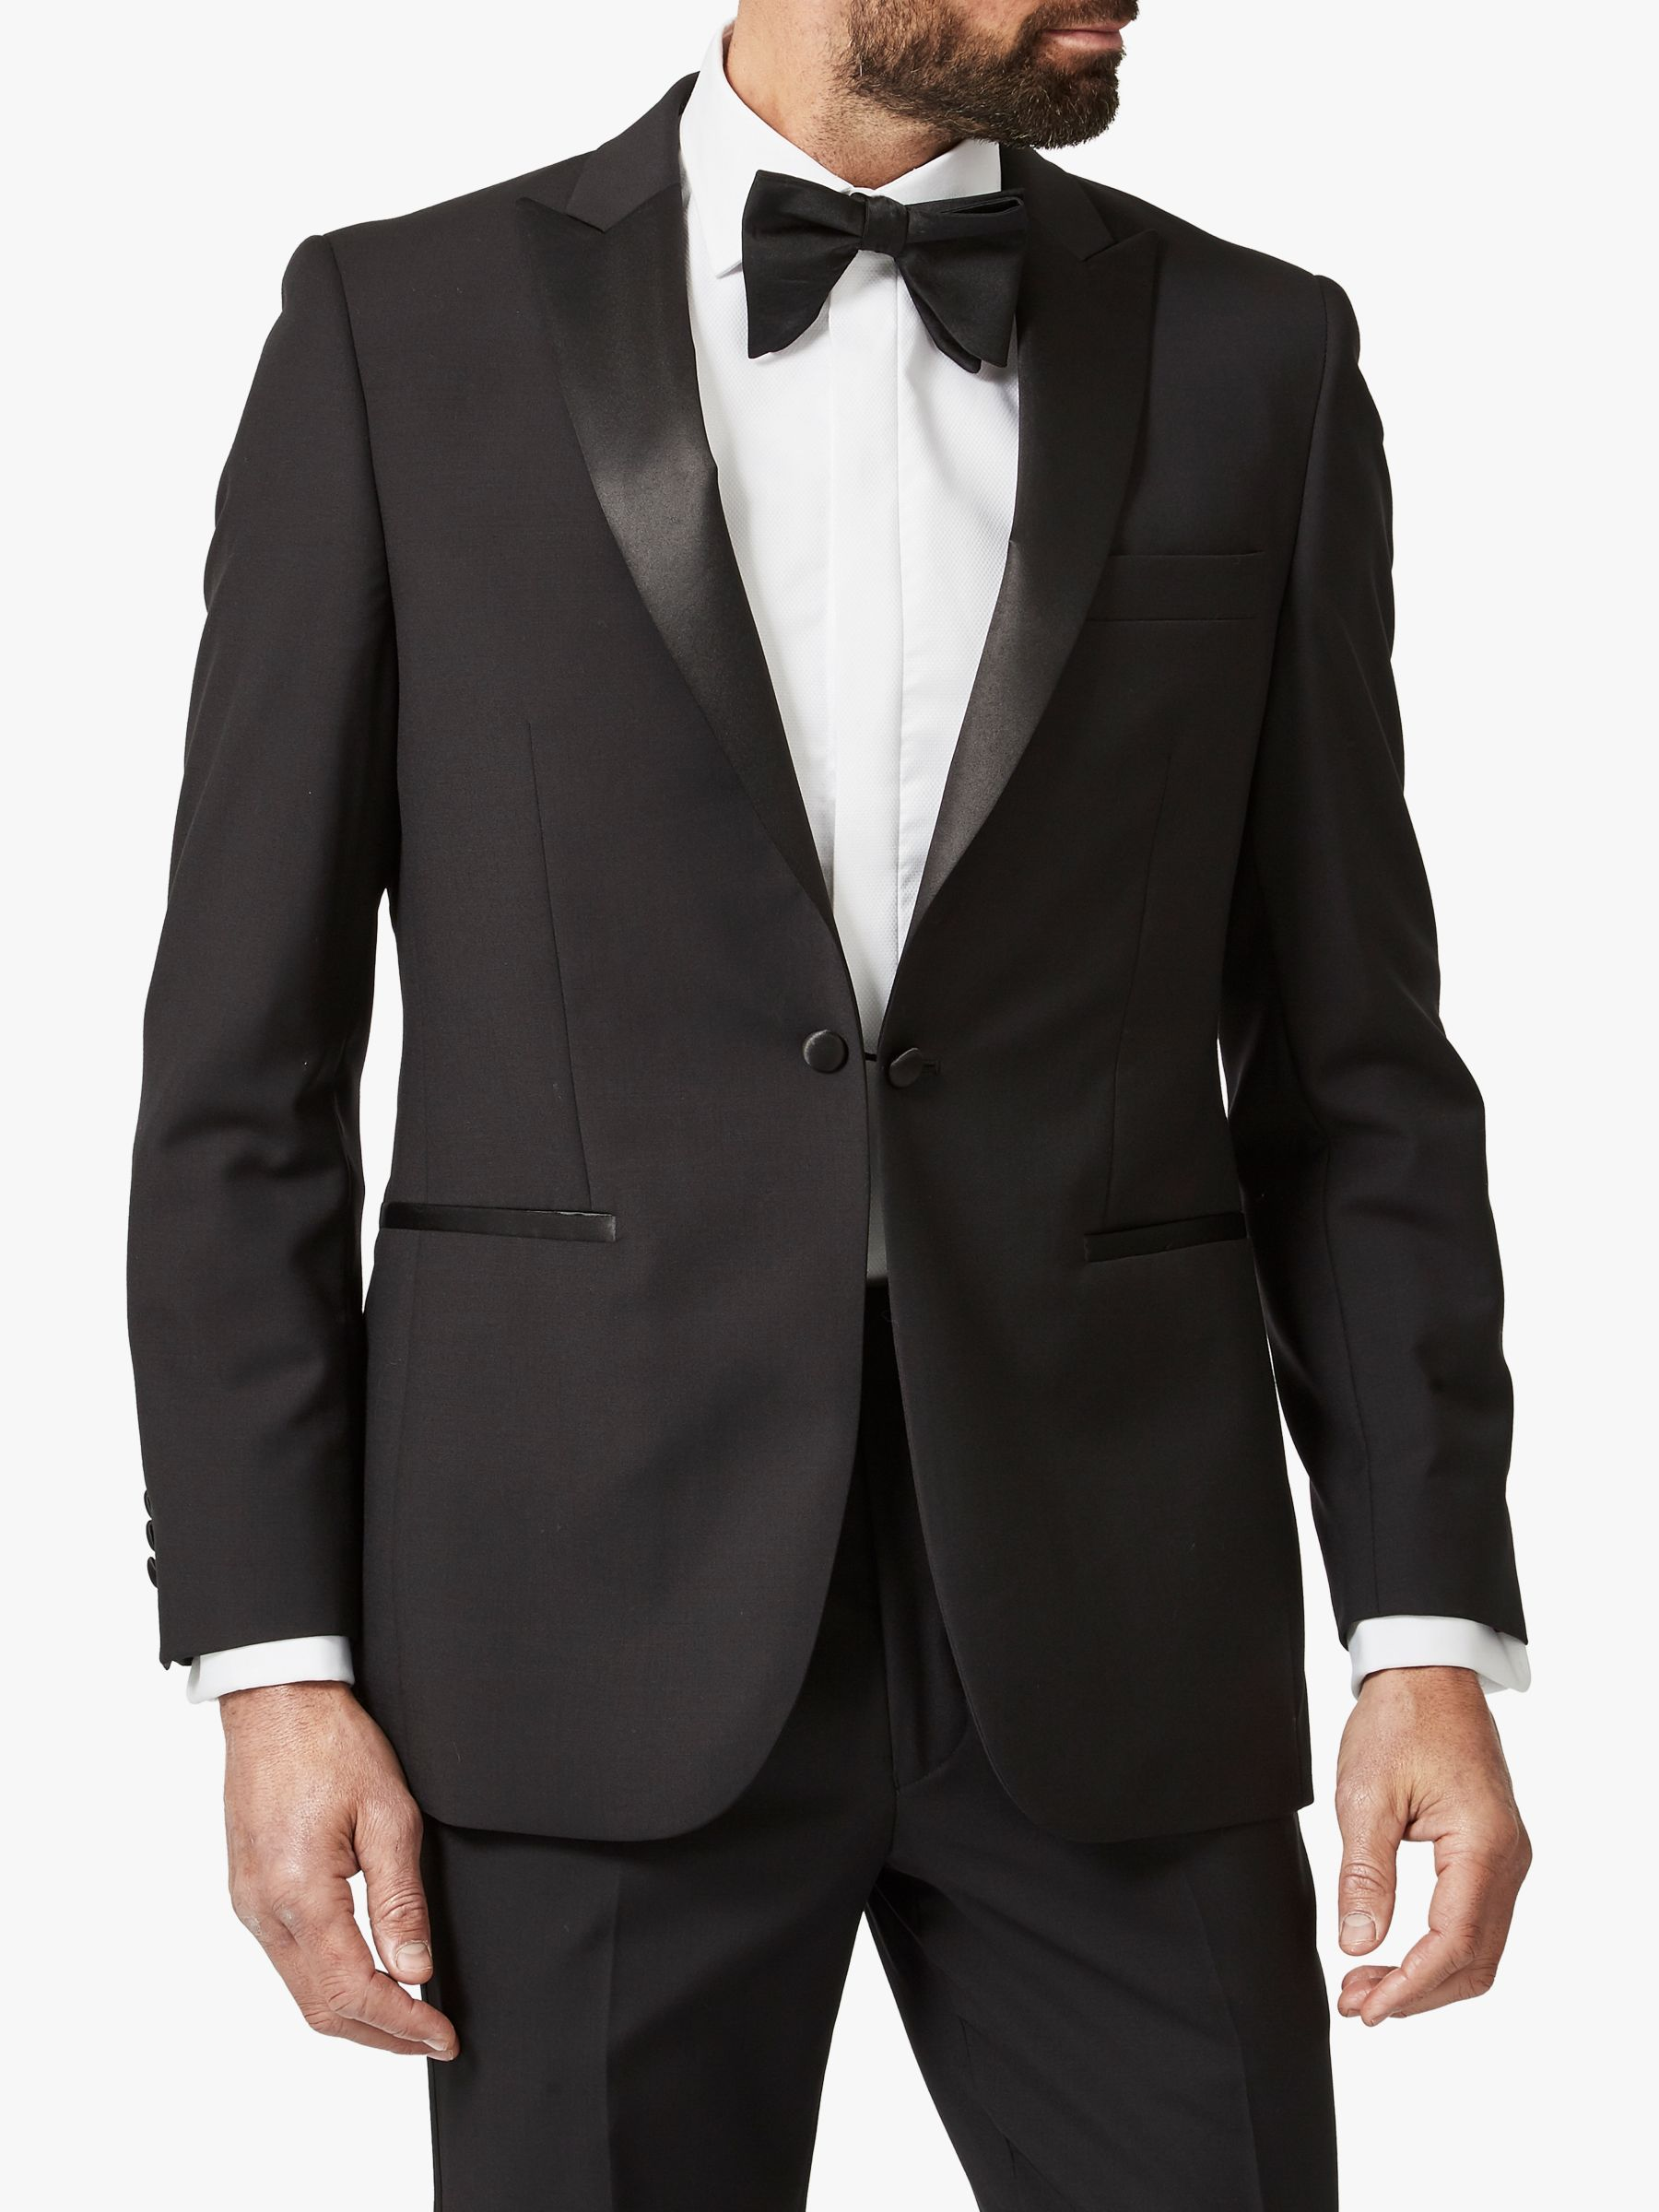 Chester by Chester Barrie Chester by Chester Barrie Wool Mohair Slim Fit Dress Suit Jacket, Black